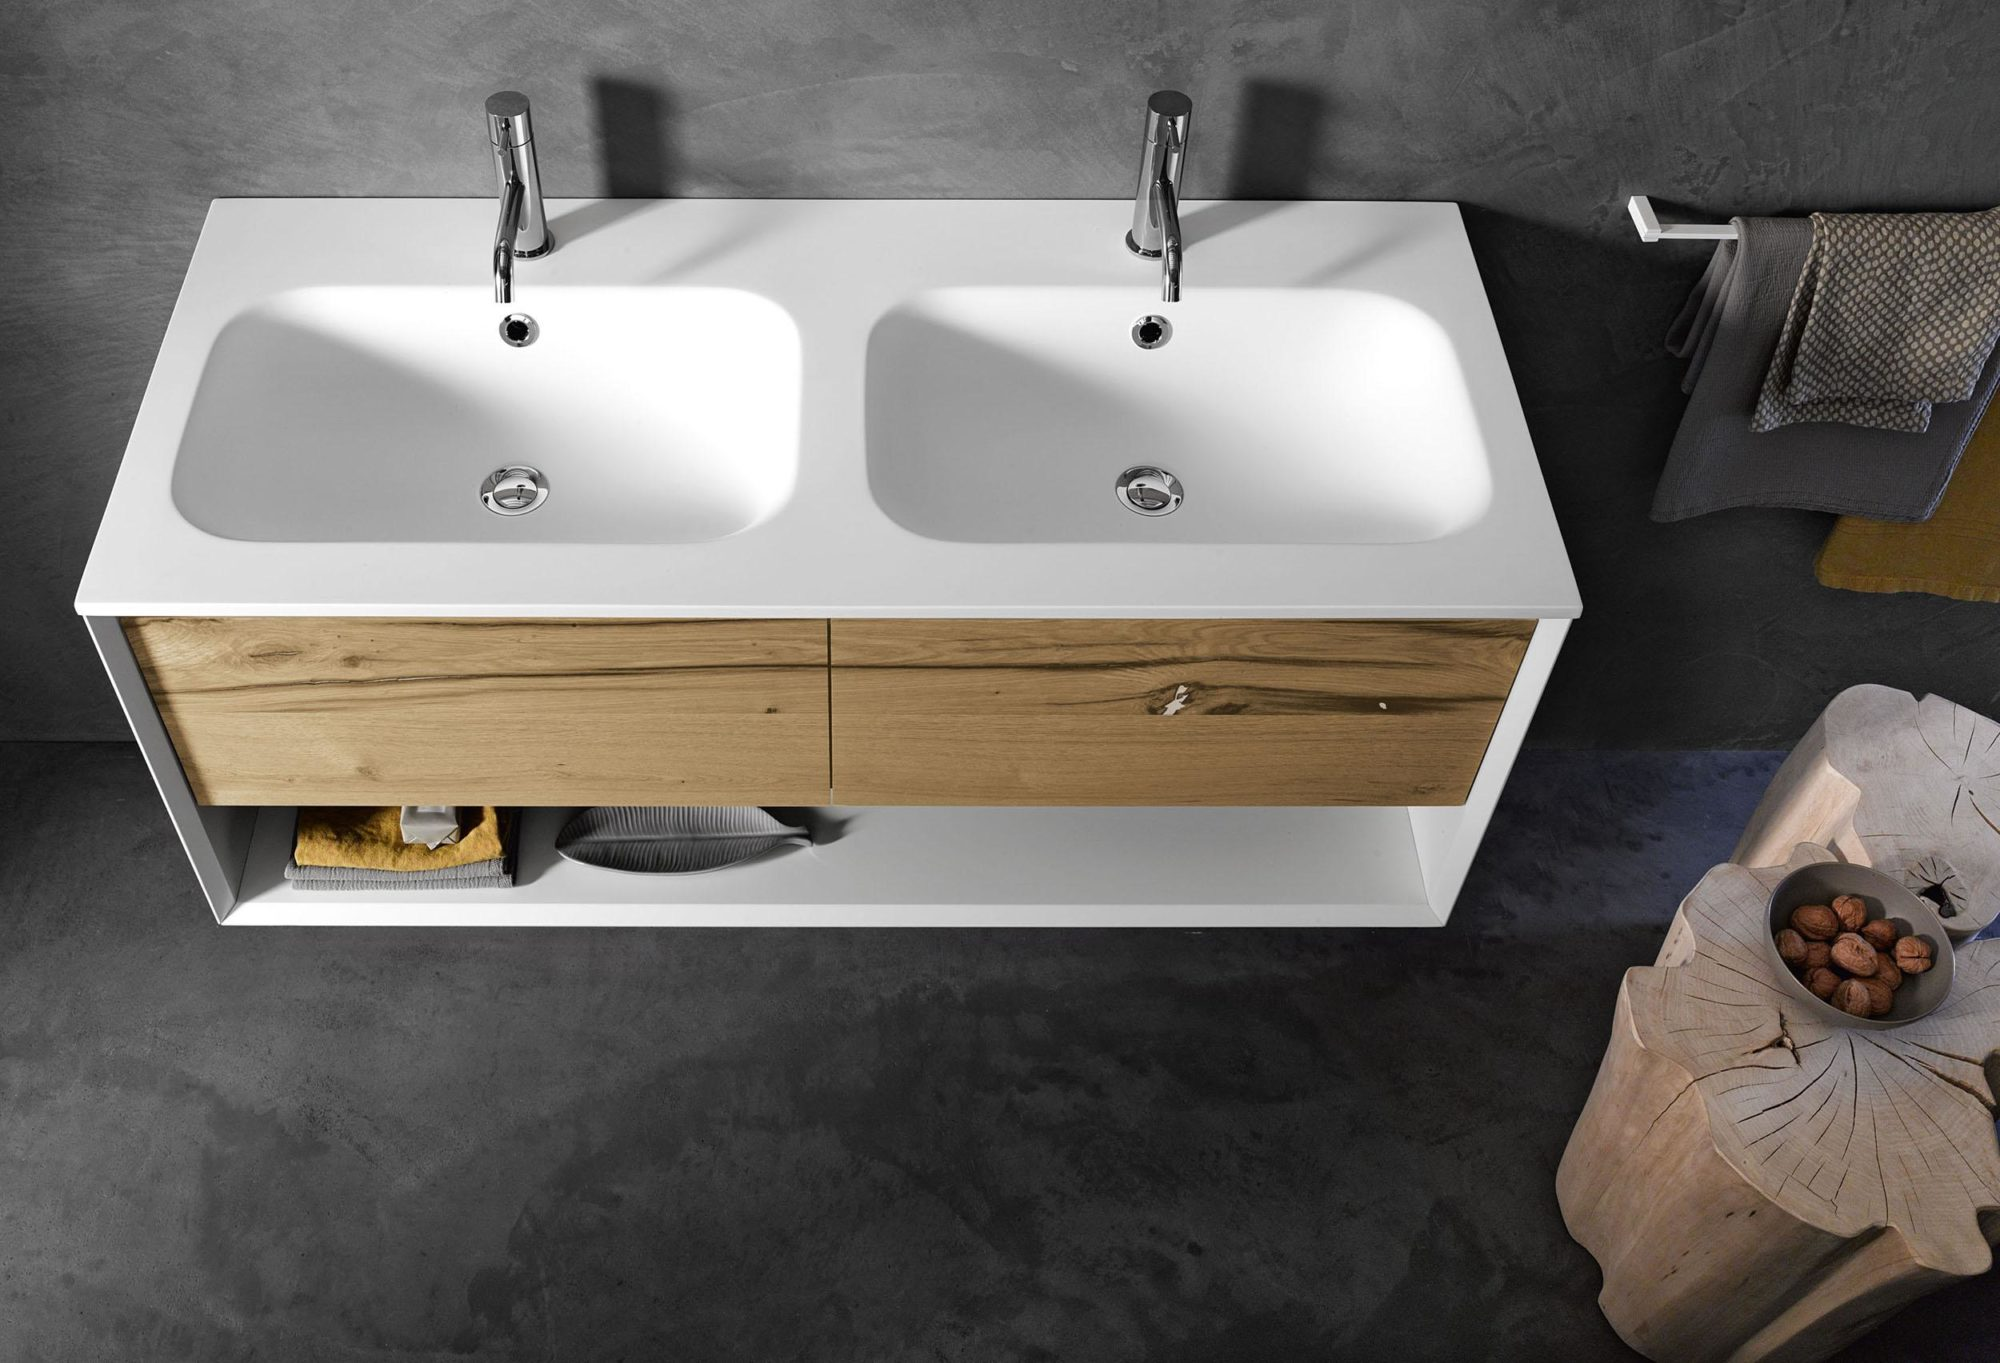 Enlever Bidet Salle De Bain ~ magasin de carrelage toulouse stunning meuble salle de bain avec